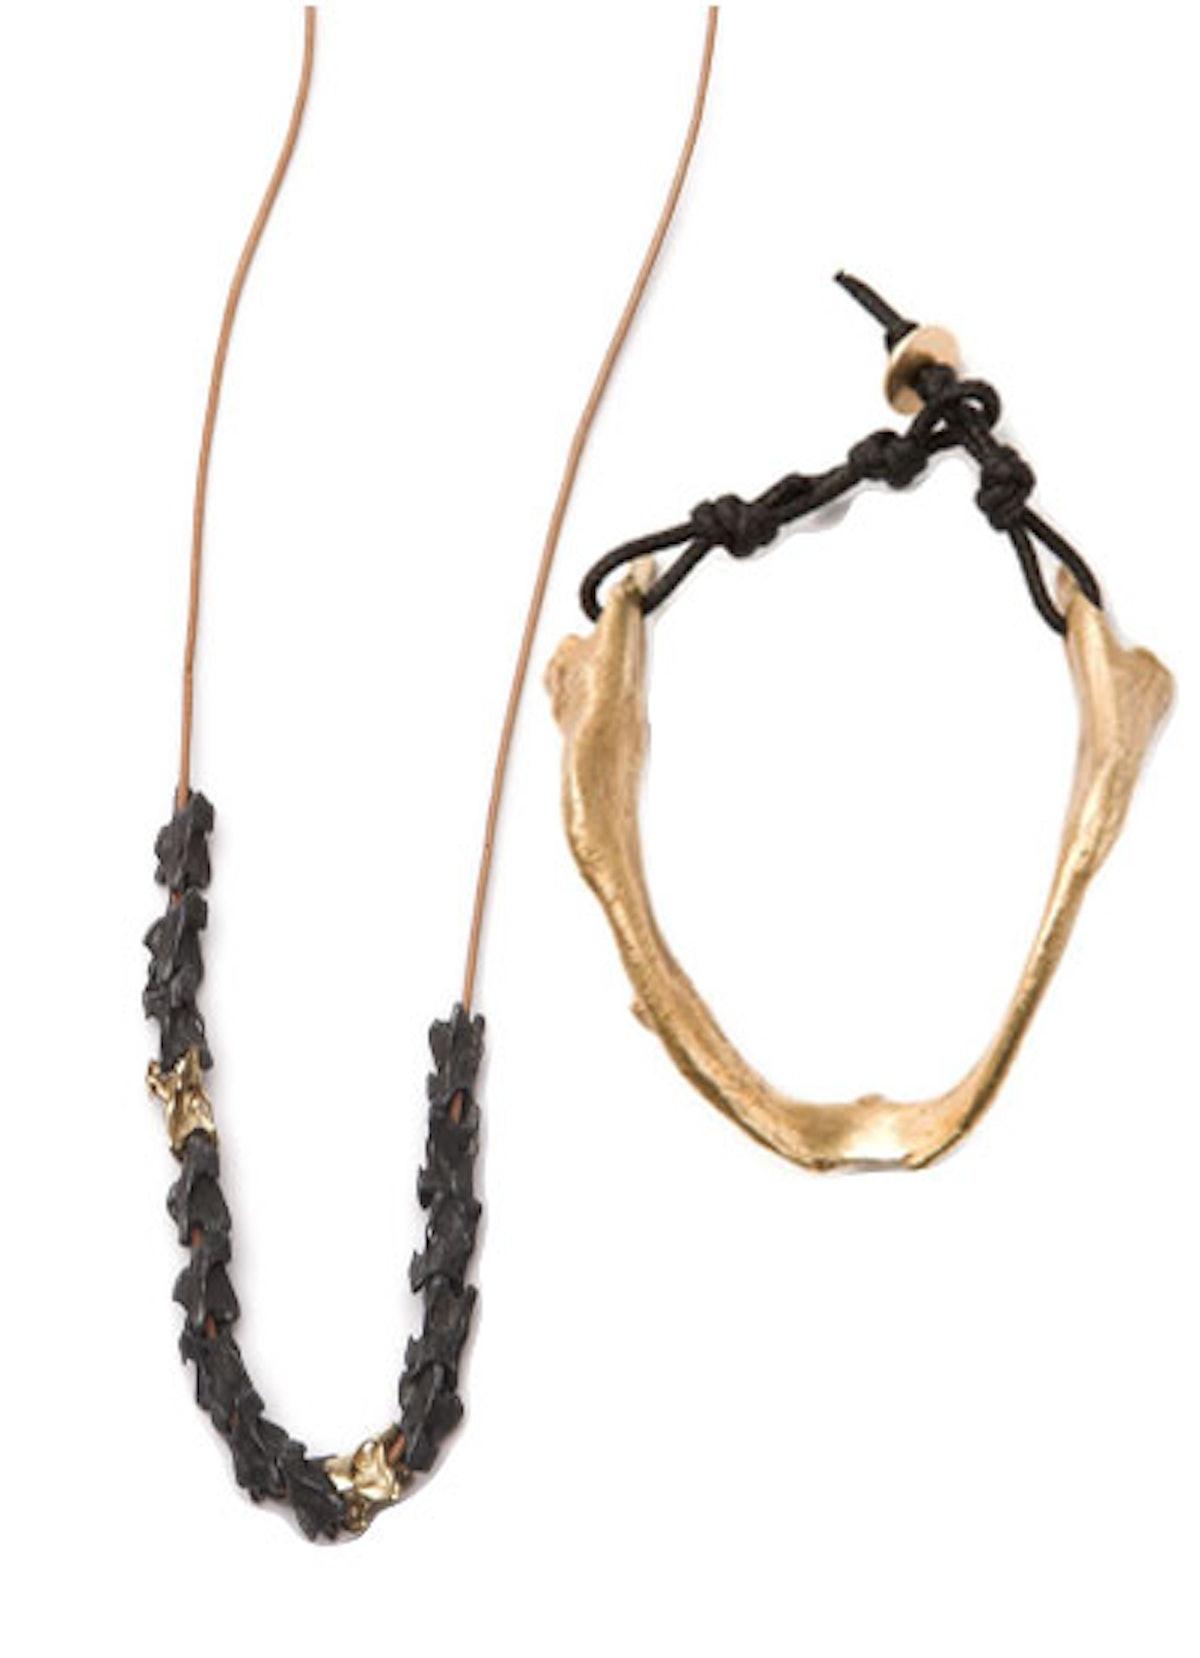 acss-brooklyn-jewelry-07-v.jpg